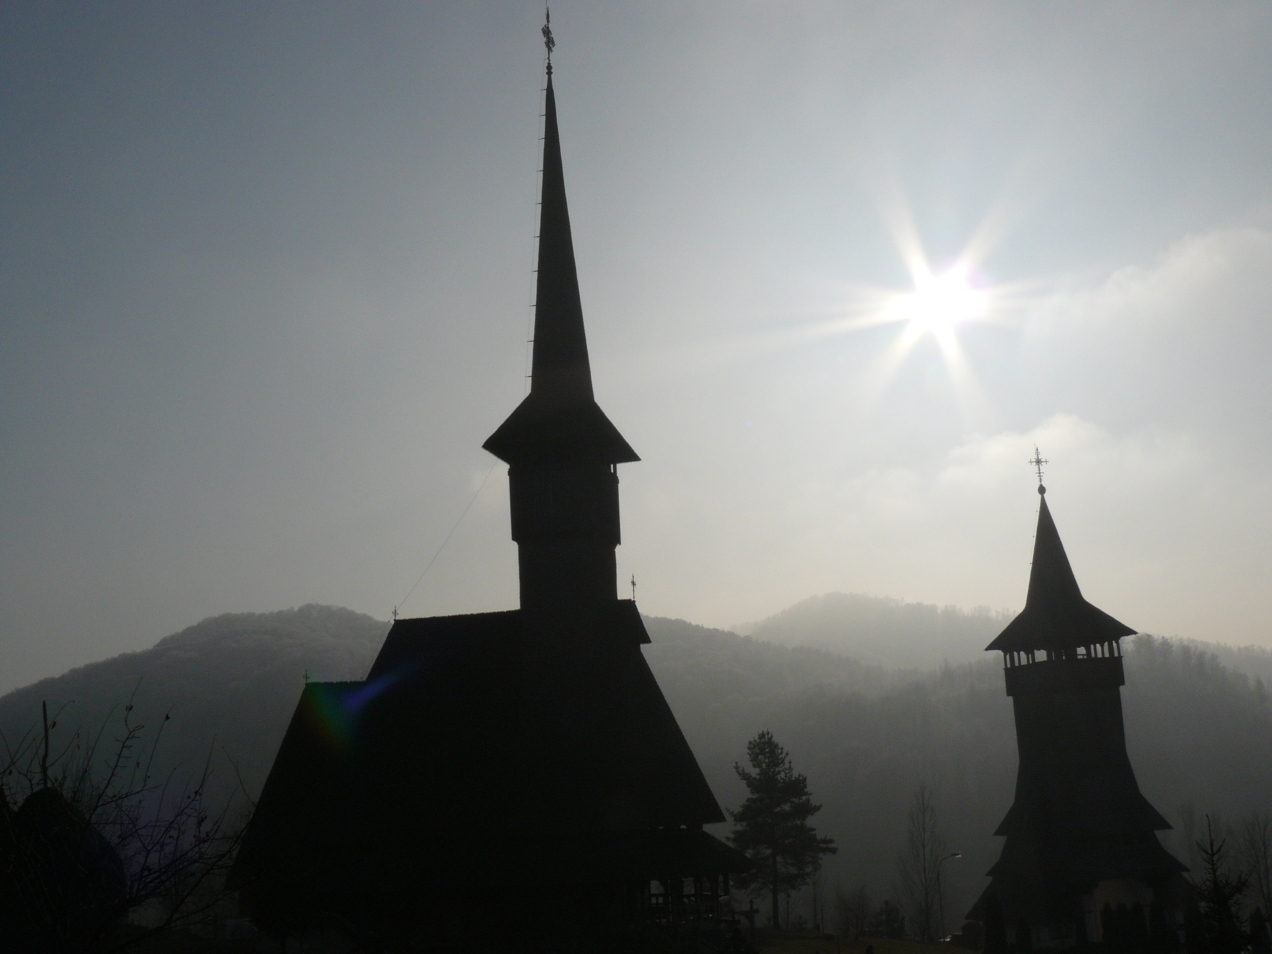 Iarna la Manastirea Barsana